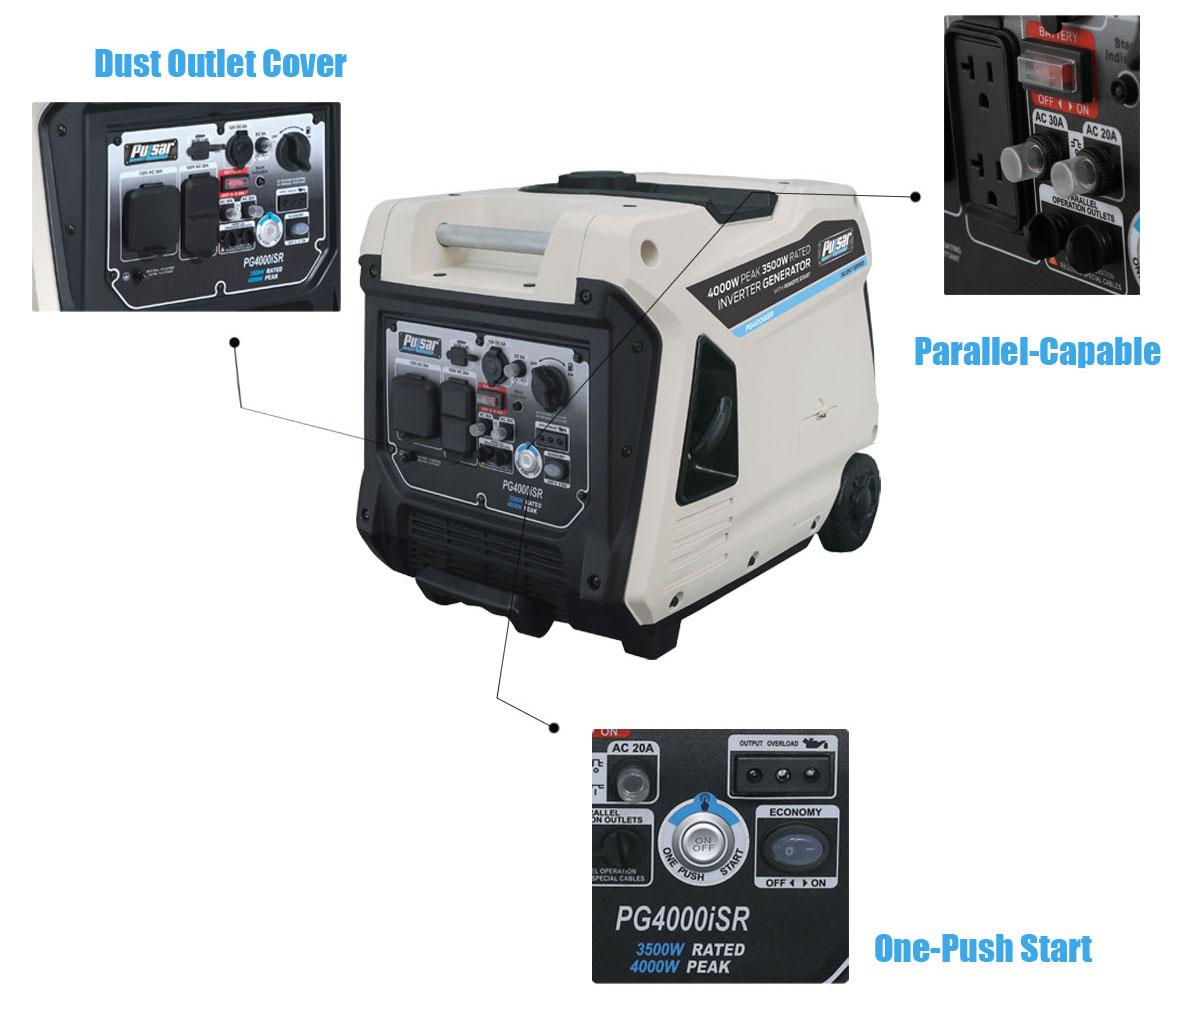 Pulsar 4000 Watt Inverter Generator with Remote Start - Newegg com